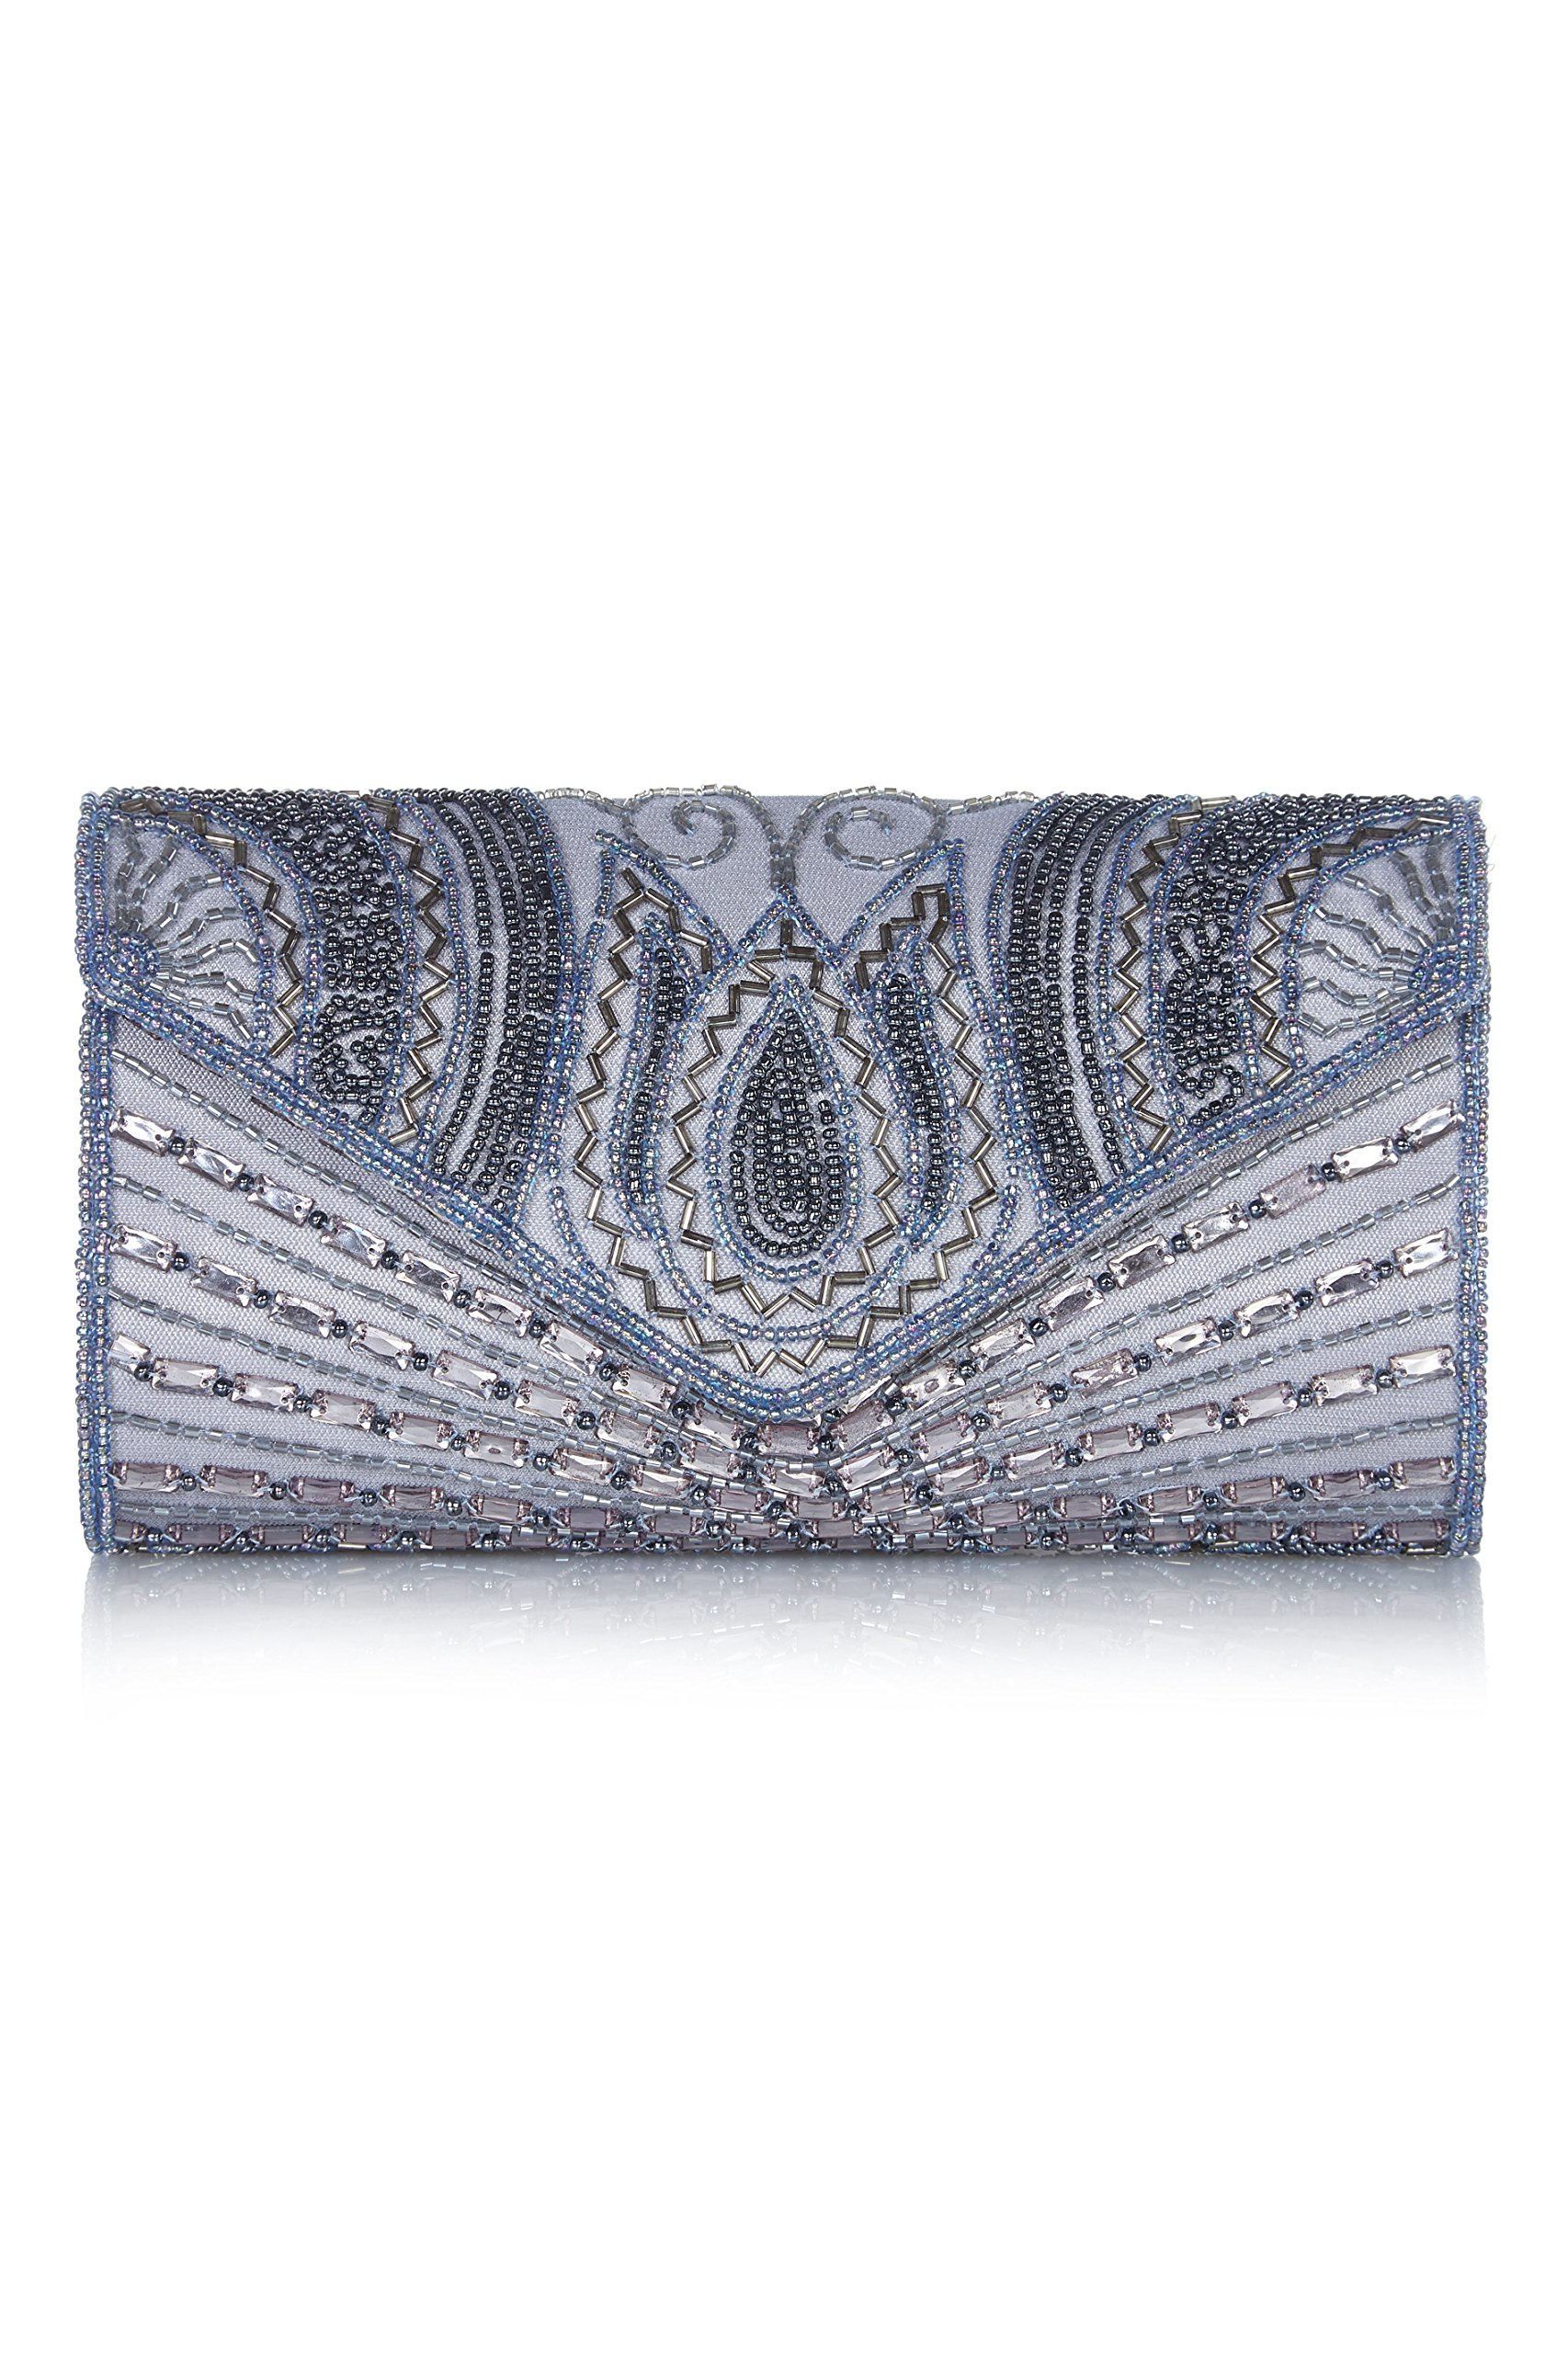 Beatrice Vintage Inspired Hand Embellished Clutch Bag in Lilac